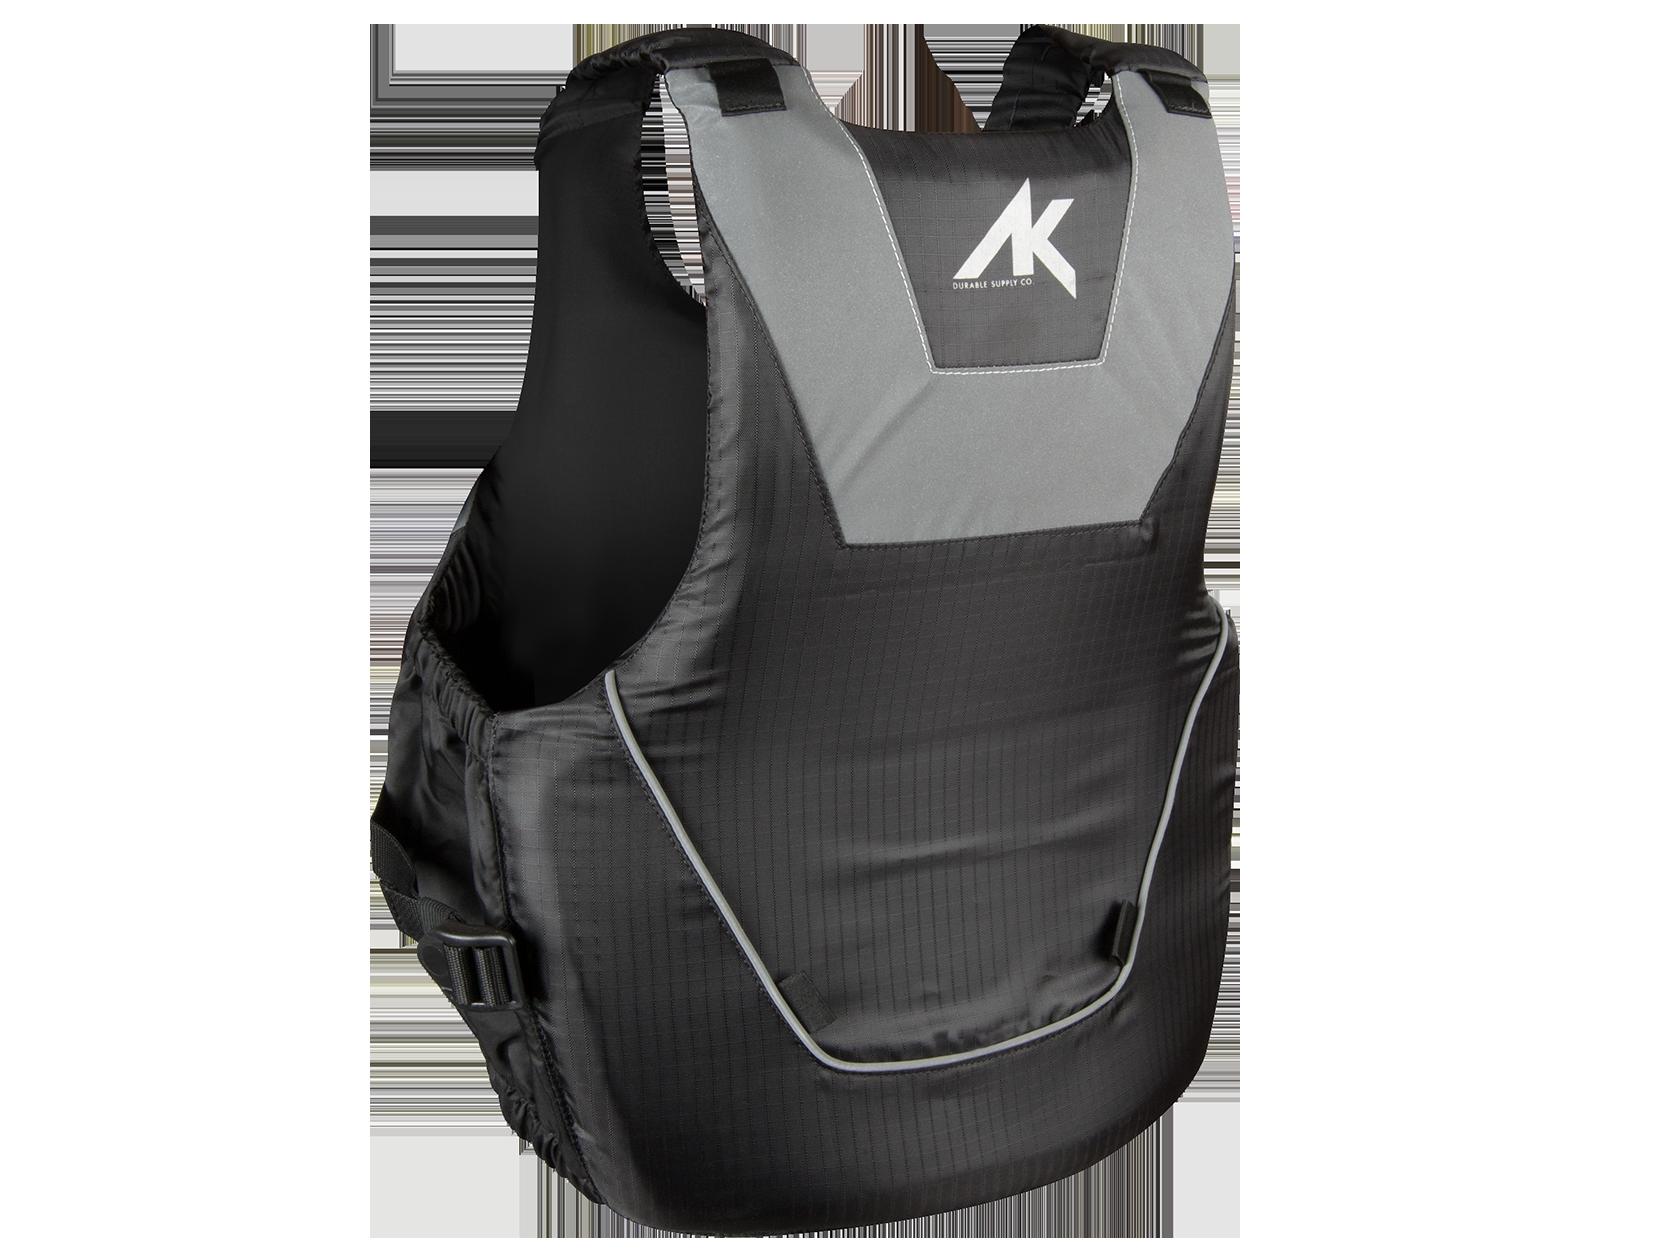 20_AK_Floatation-Vest_v2_Black_img_02